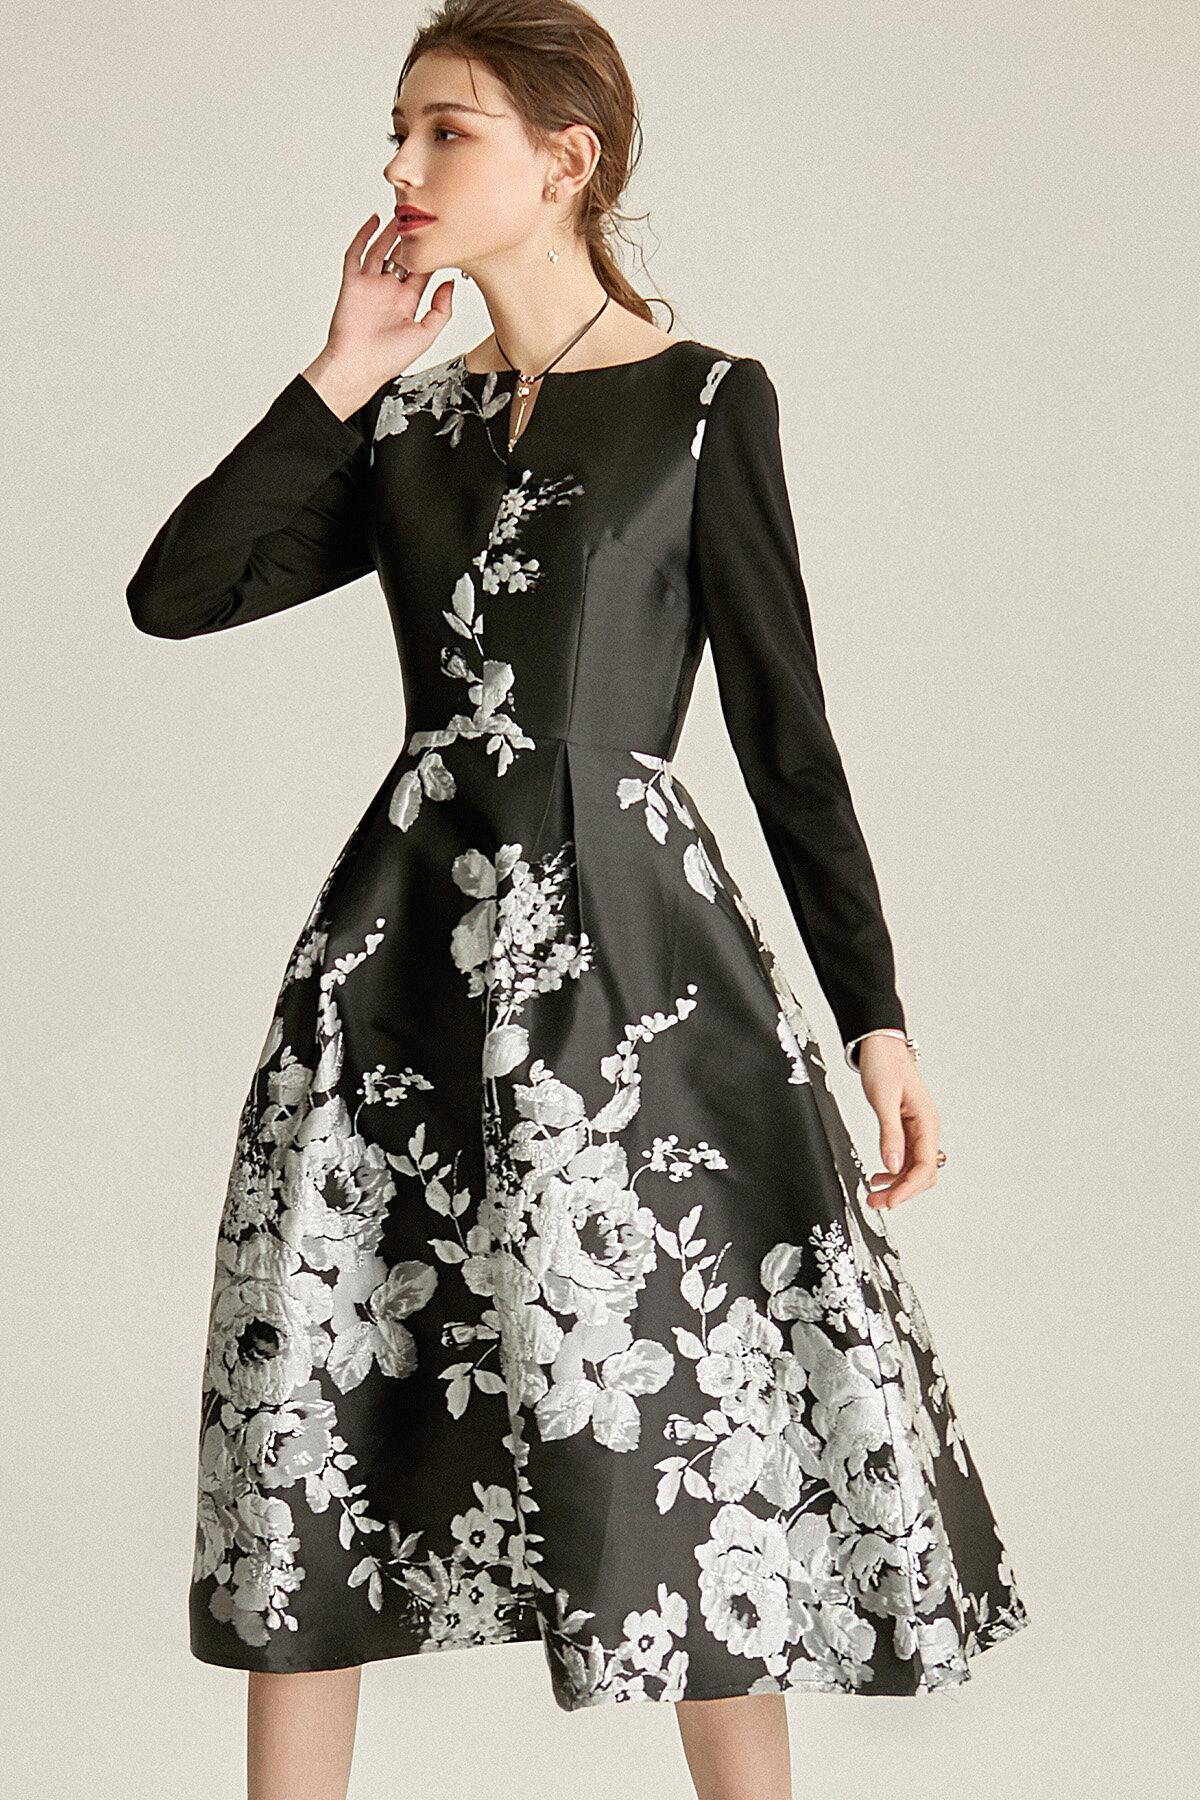 Spring Retro 1950 Lbd Black Jacquard Long Sleeve Wedding Guest Audrey Hepburn Dress Bailey Good Girl Rebel